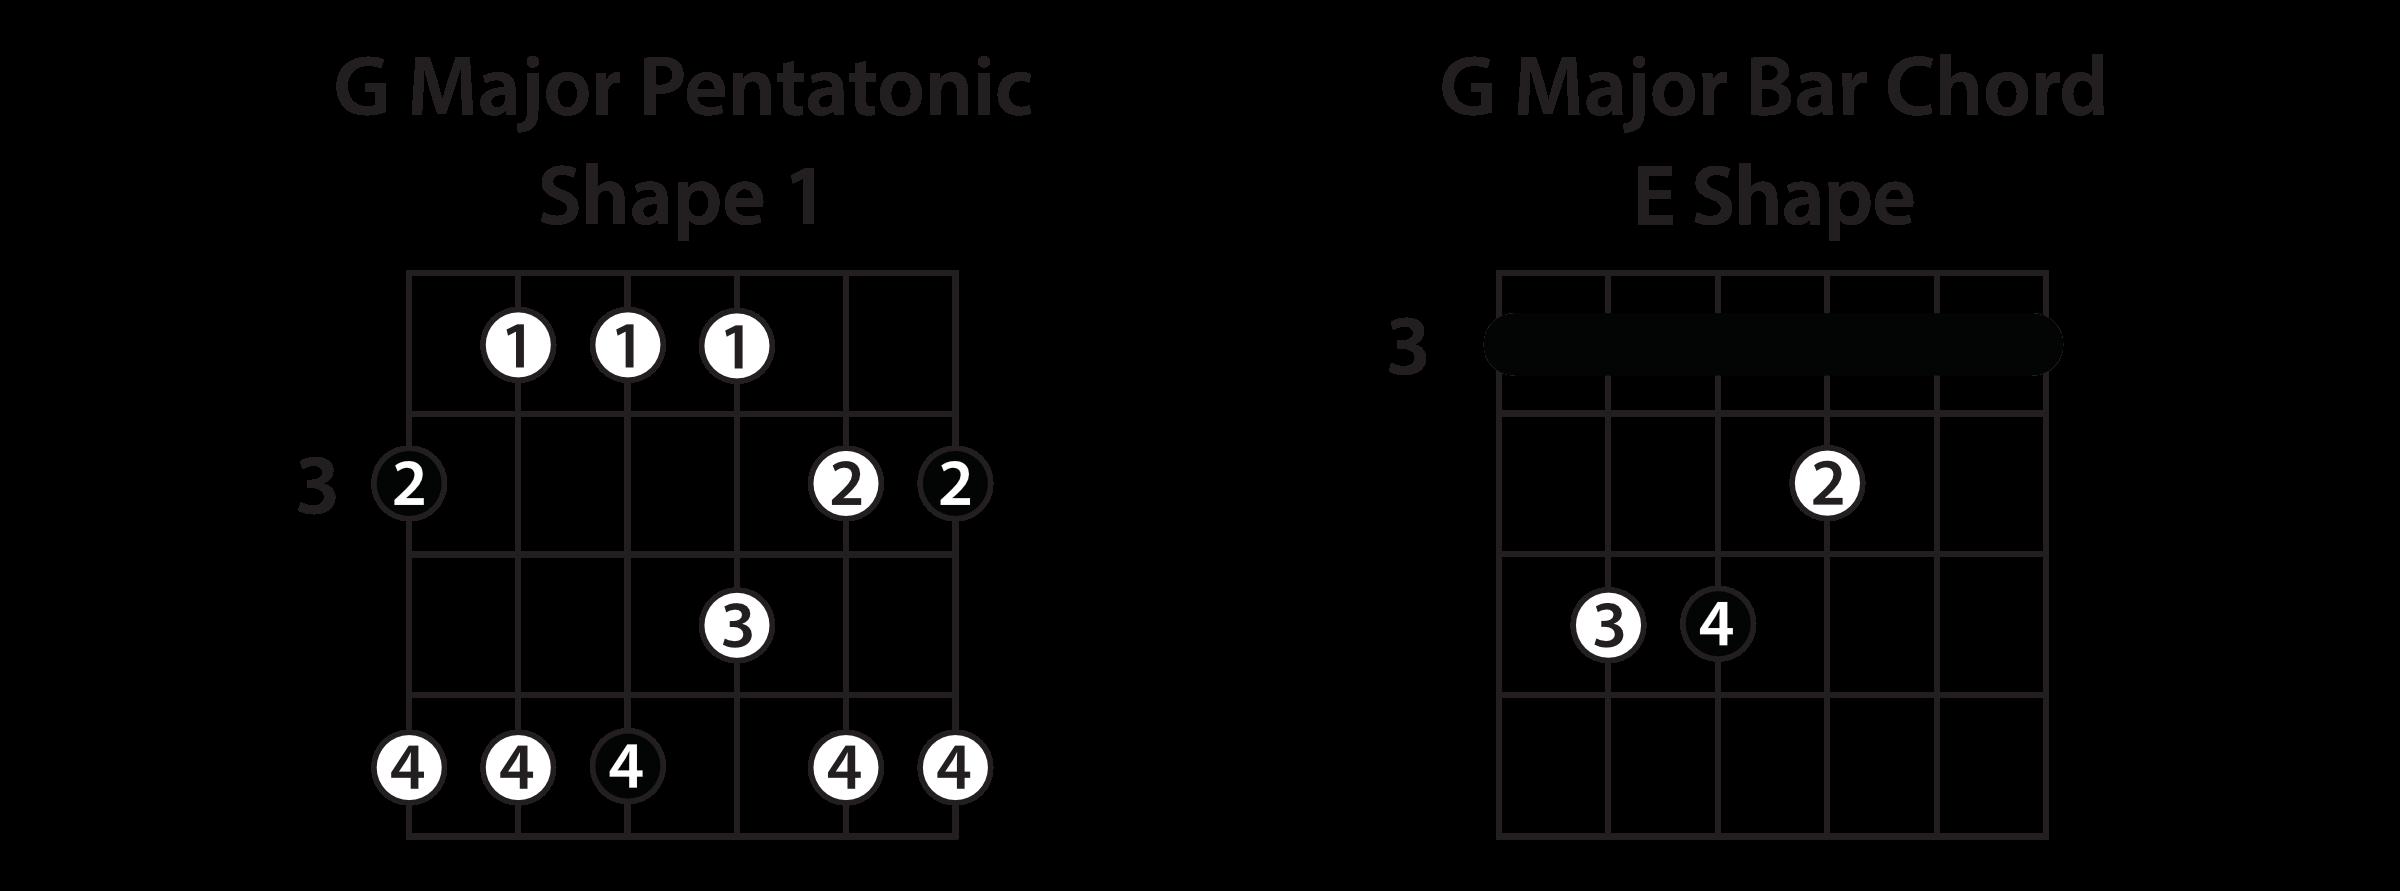 Major Pentatonic Scale Shapes Guitar